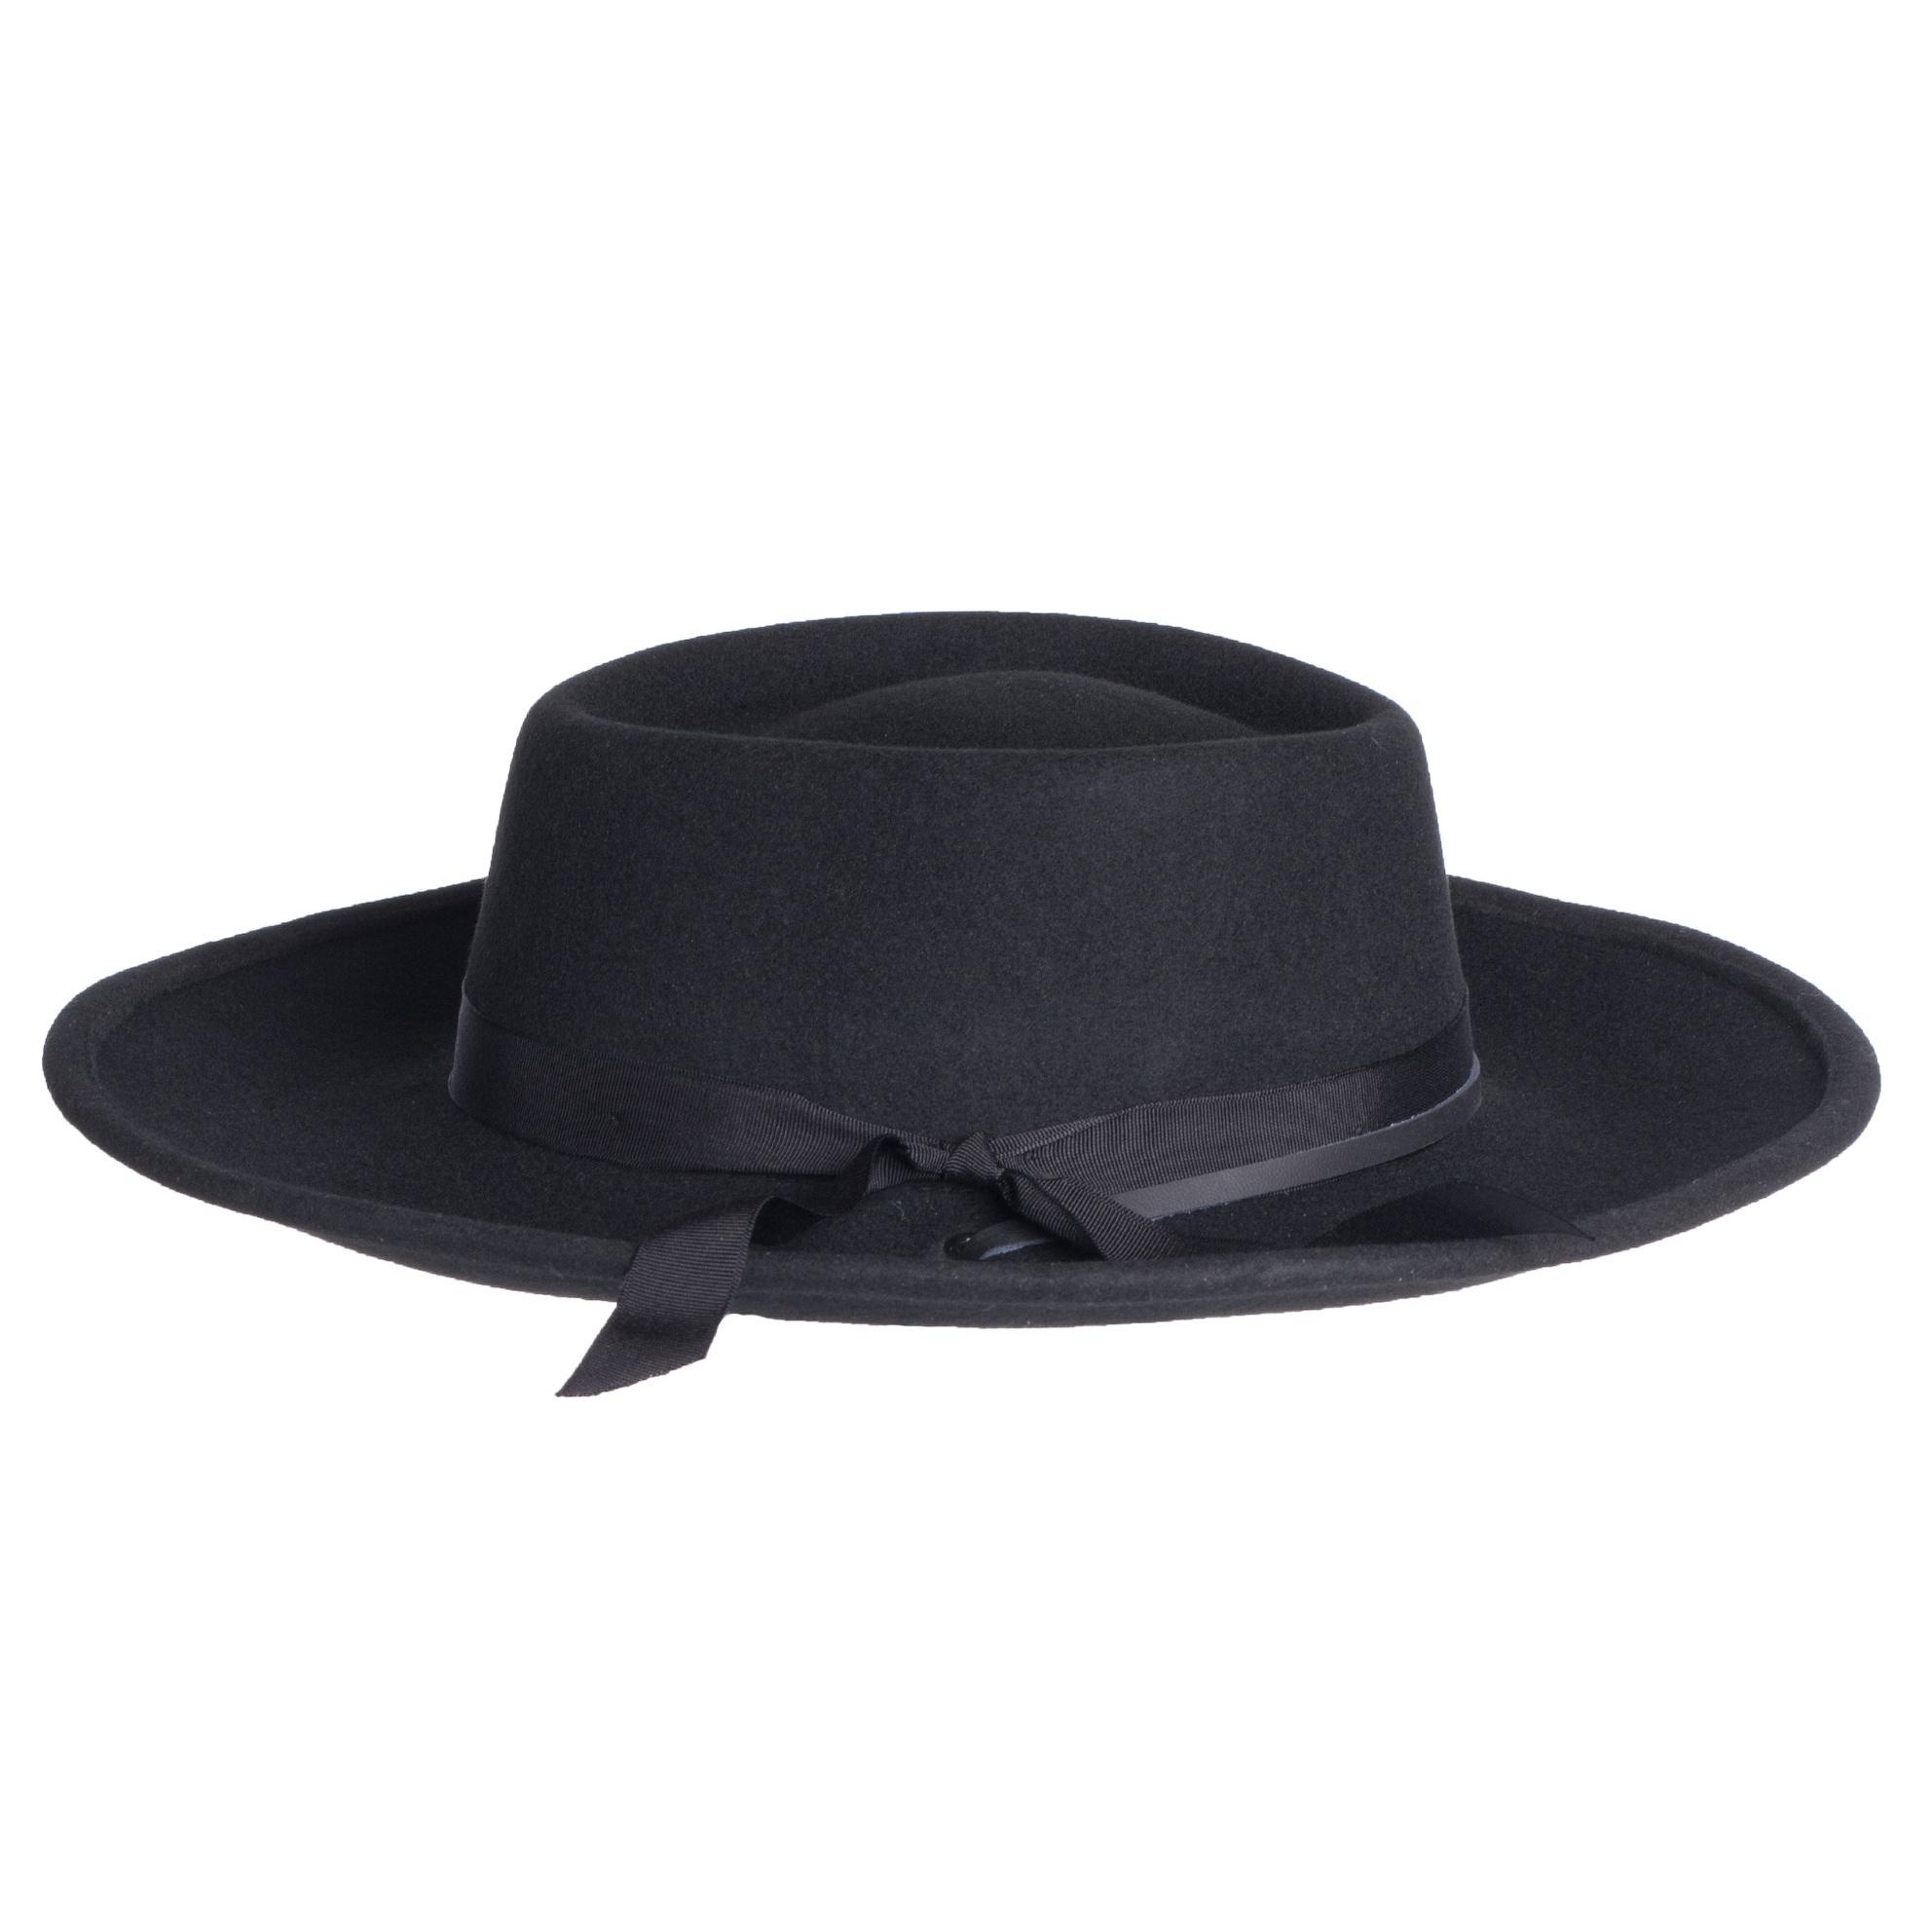 Shop Mens Wyatt Earp Style Wide Brim Wool Fedora Hats - Free ... 672d9f6d1b1